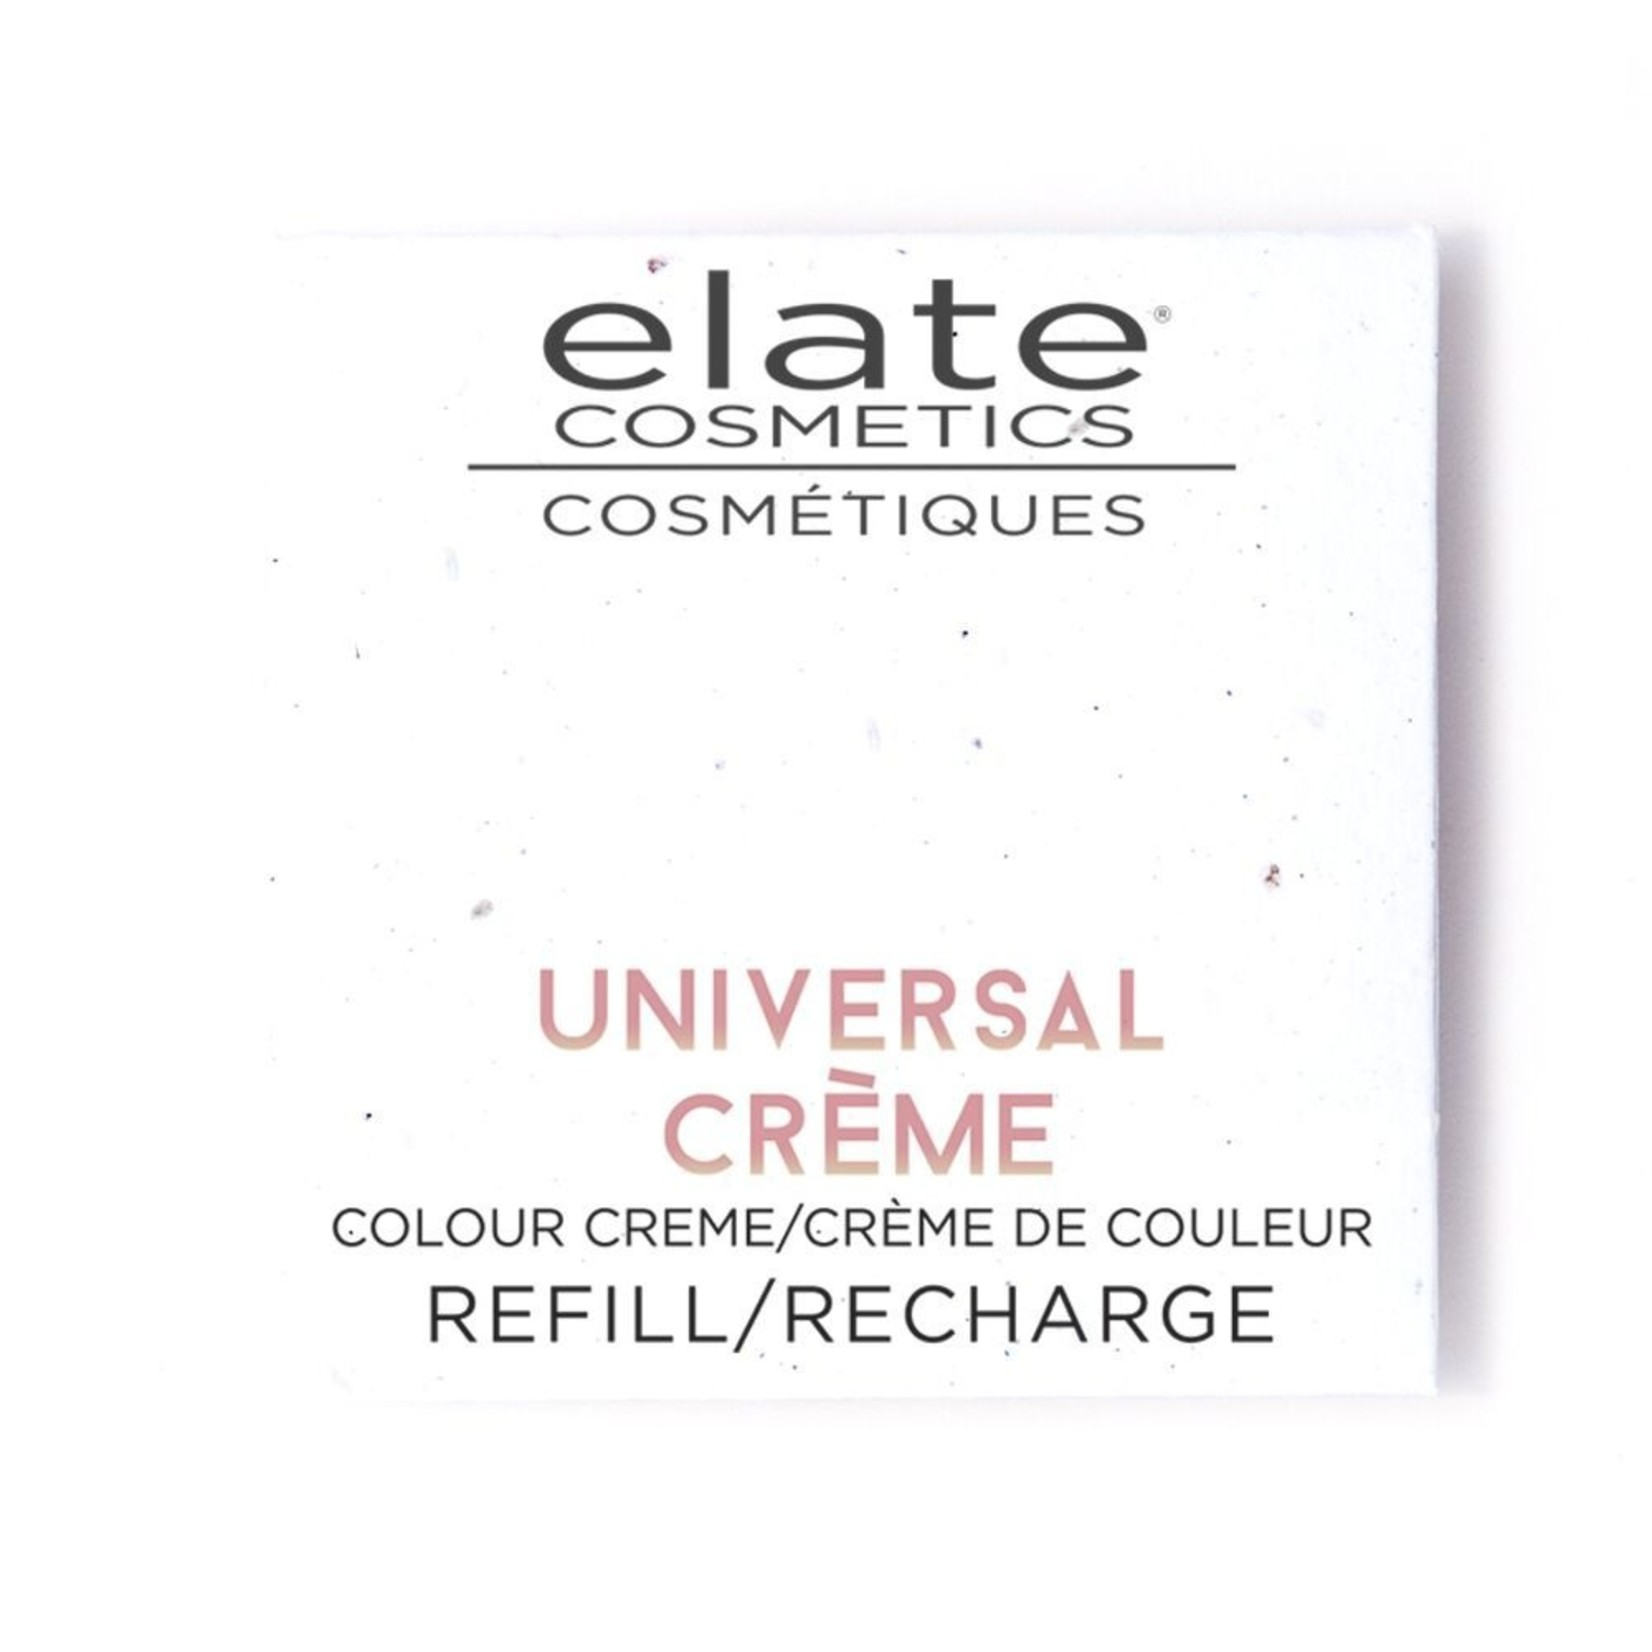 ELATE COSMETICS UNIVERSAL CREME - LOVE